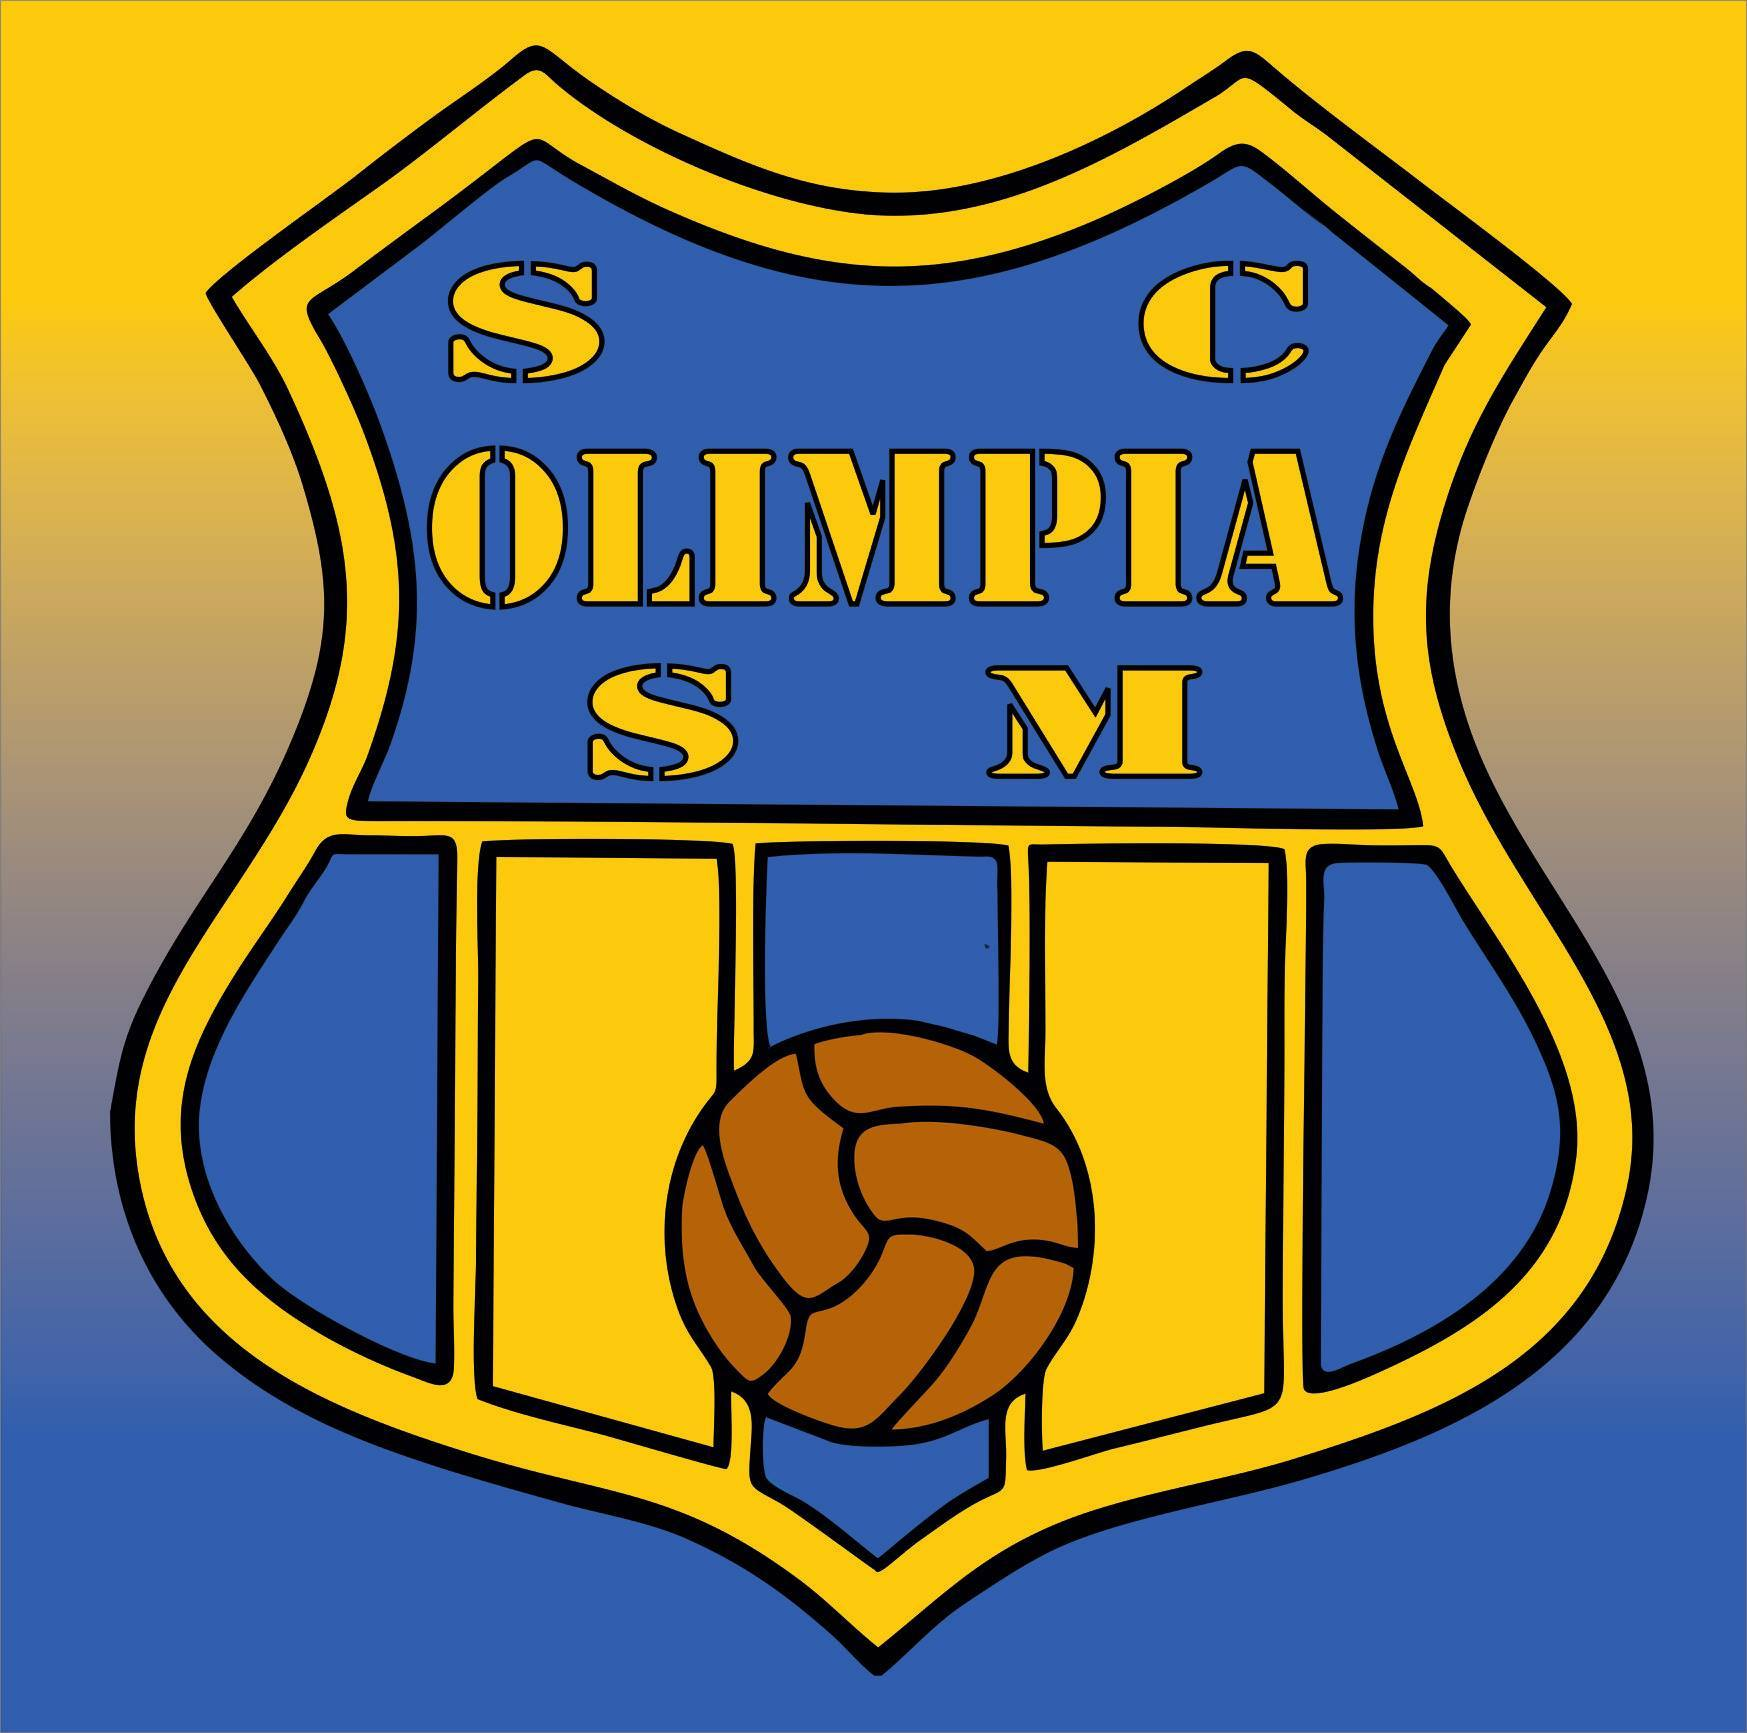 CLUB SPORTIV SUPORTER CLUB OLIMPIA MCMXXI logo